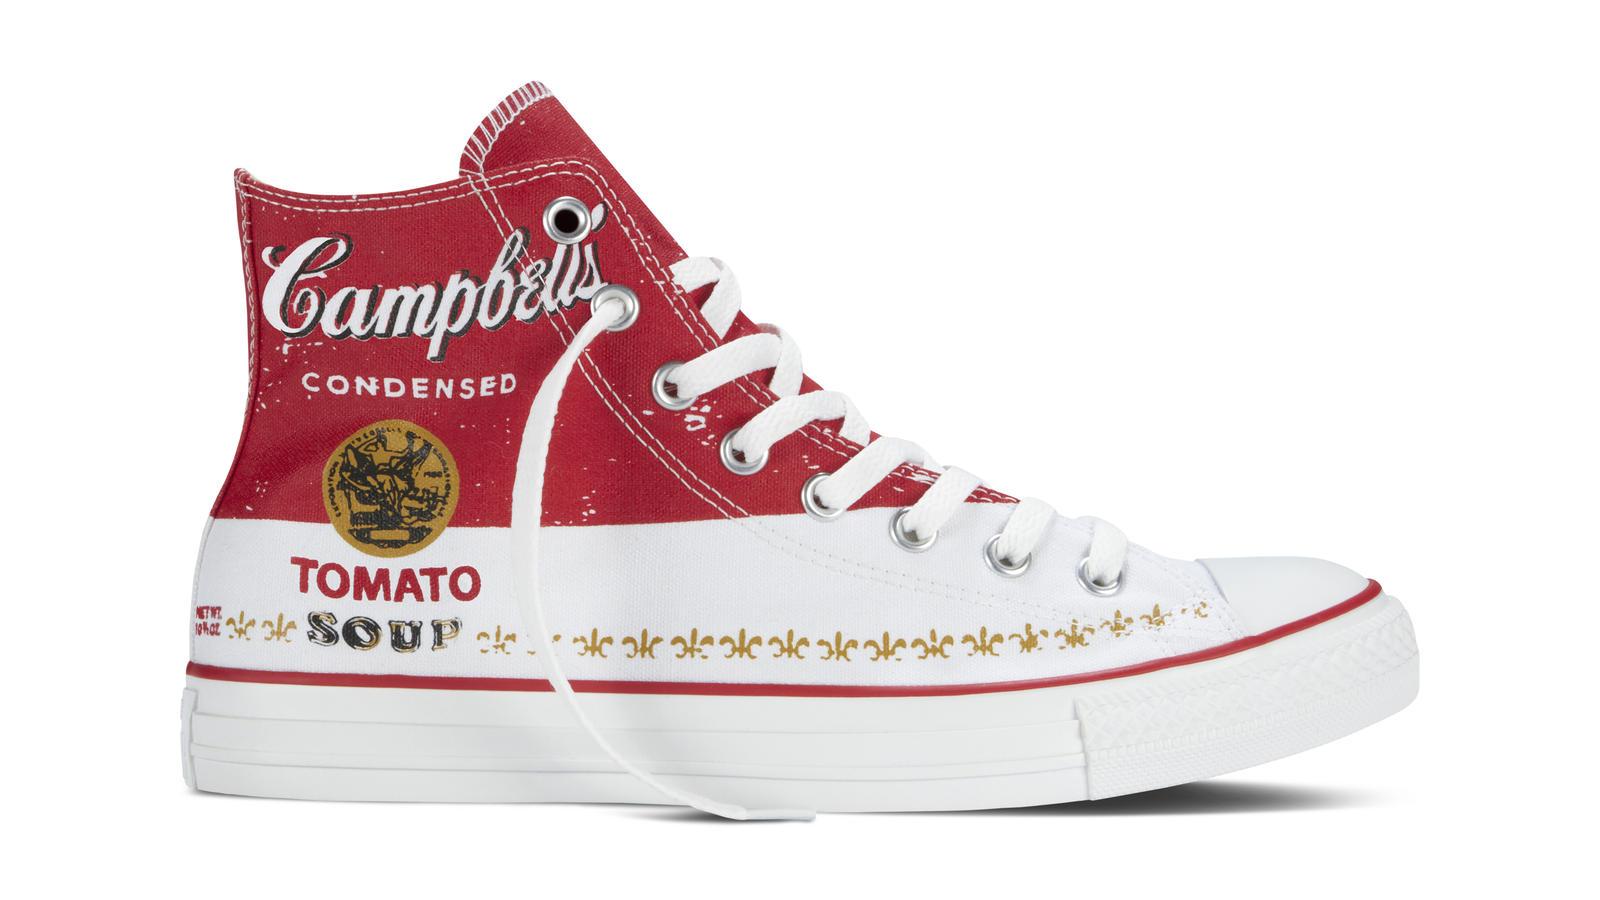 Converse Celebrates the Creative Spirit of Andy Warhol